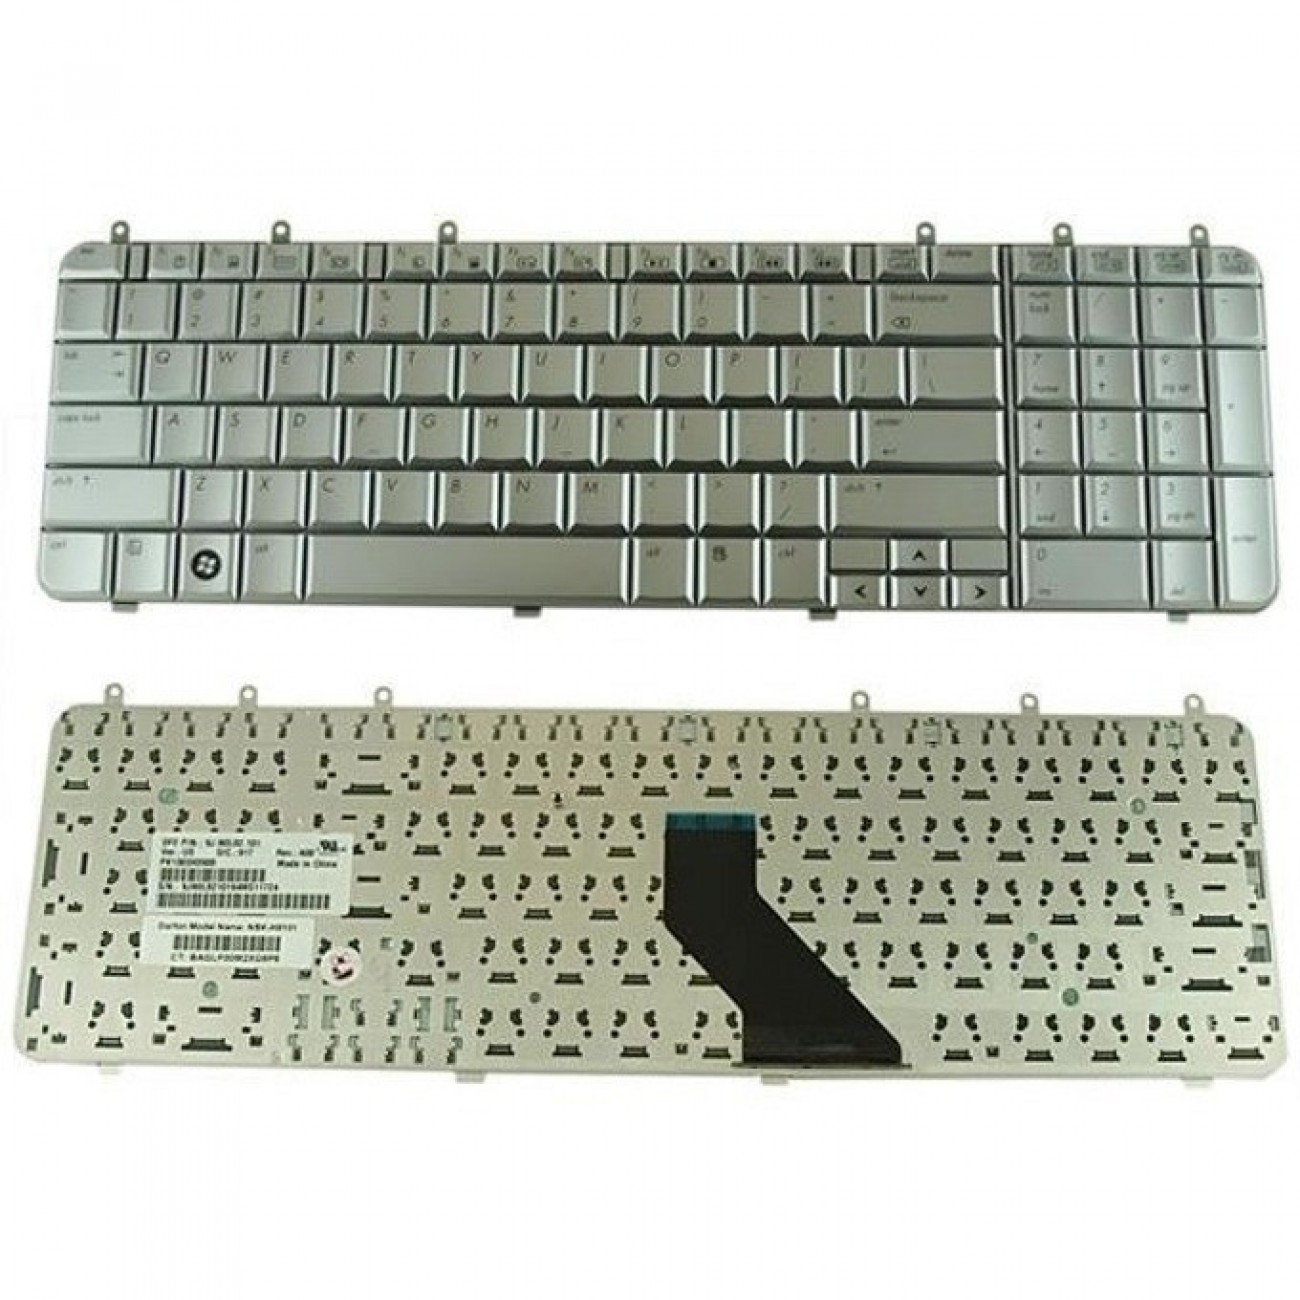 Клавиатура за HP Pavilion DV7 DV7-1000, UK, сребриста в Резервни части -  | Alleop